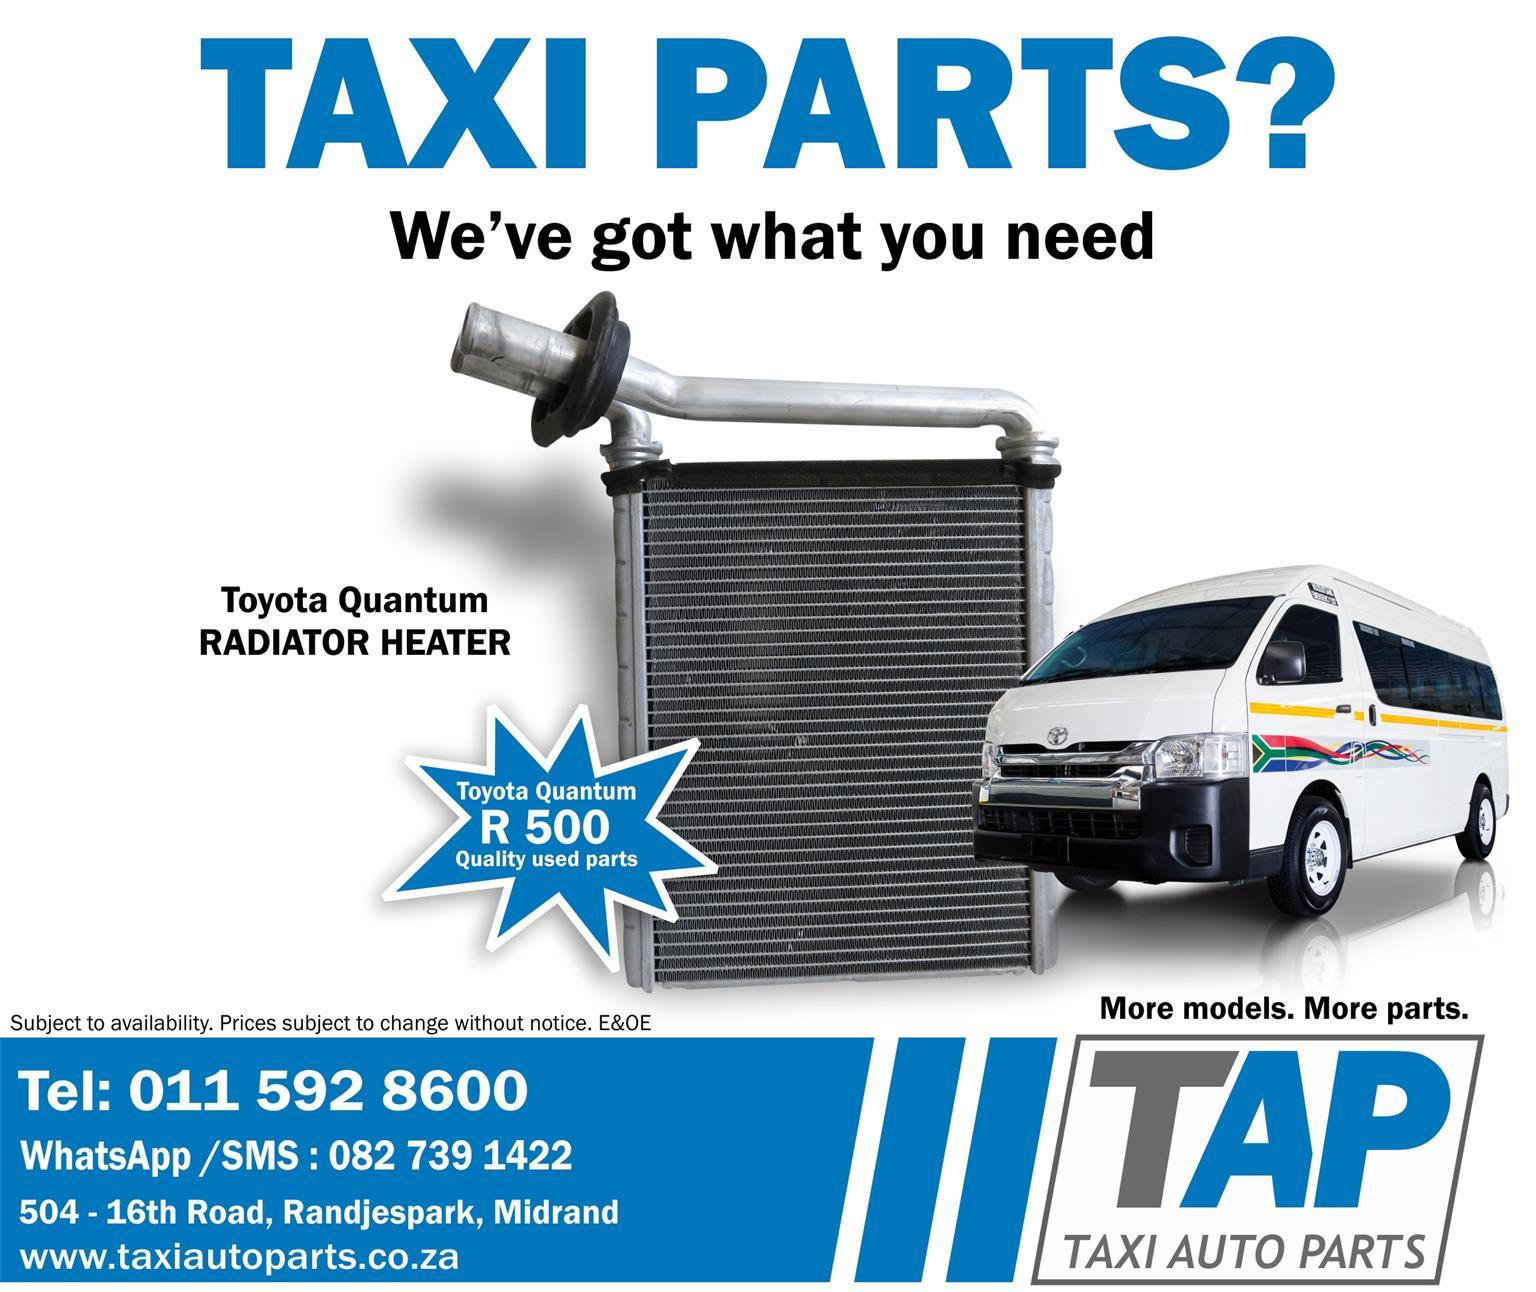 Toyota Quantum RADIATOR HEATER quality used taxi spares - Taxi Auto ...